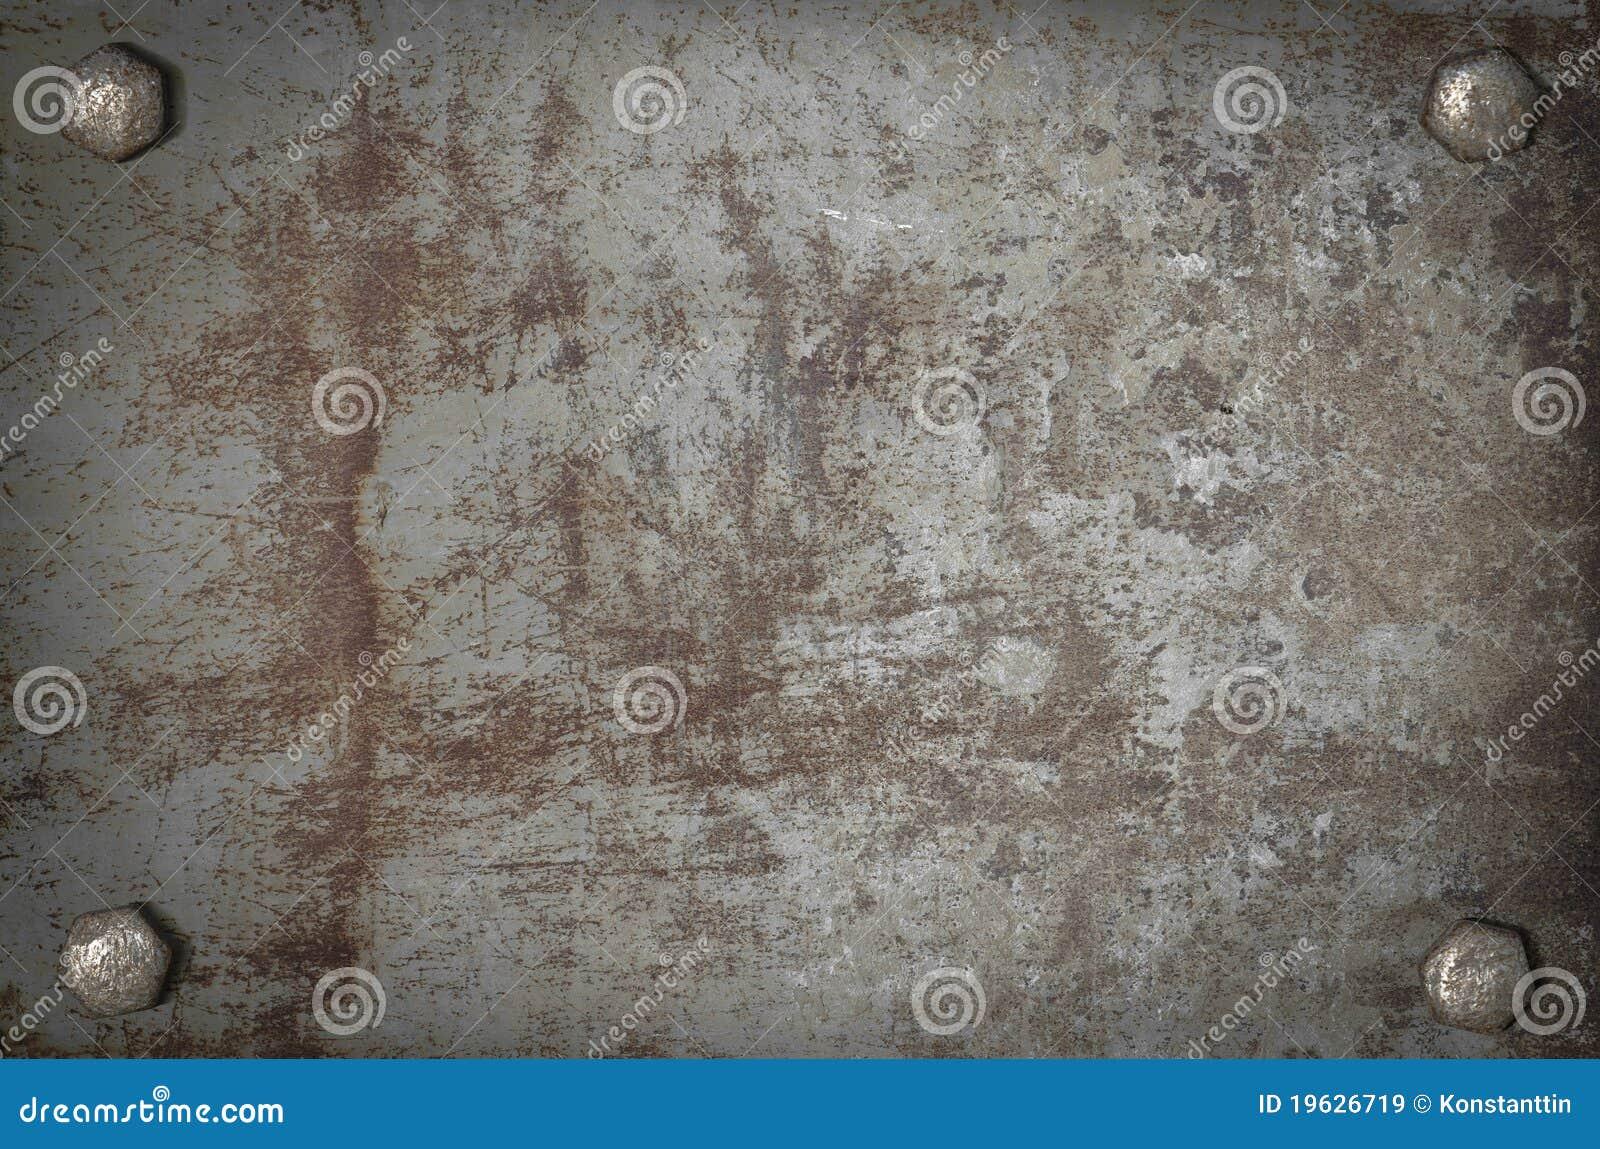 Art Grunge Metal Plate With Screws Stock Image Image Of Dirty Rustic 19626719